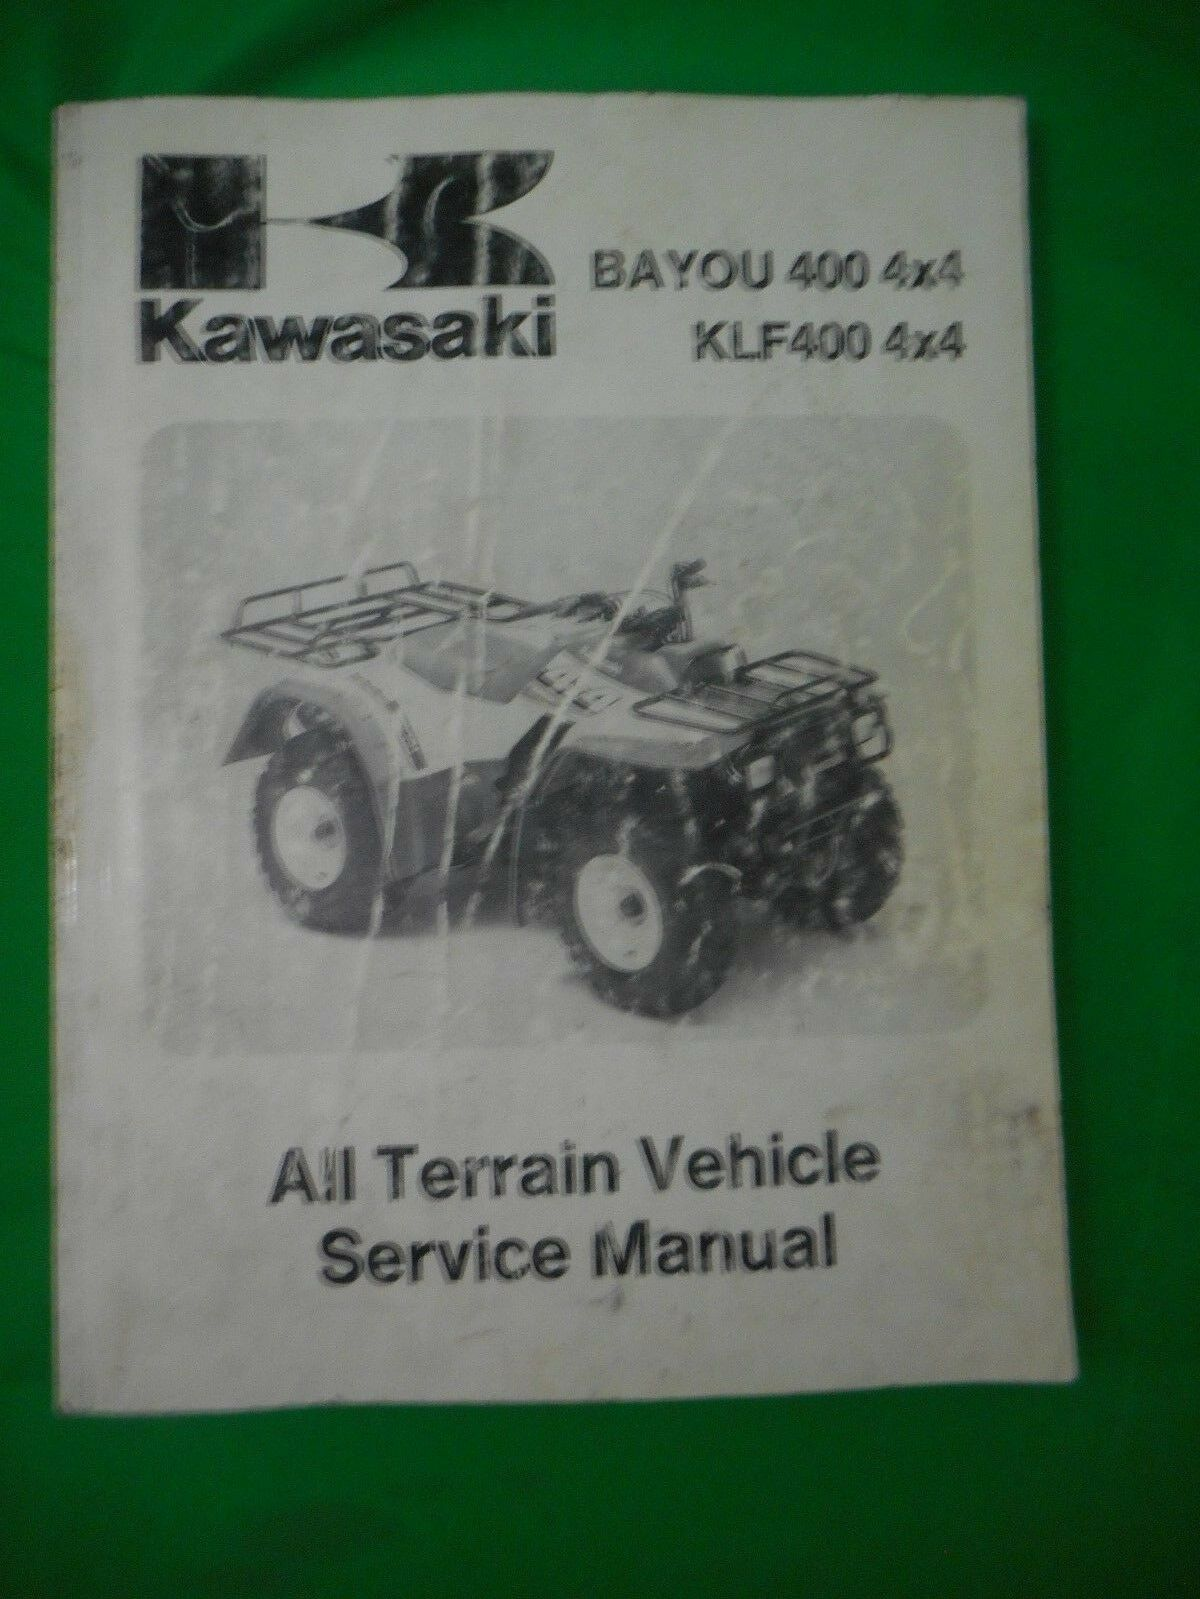 Genuine Kawasaki 93 - 95 Bayou 400 4X4 KLF400 4X4 Manual 99924-1154-02 OEM